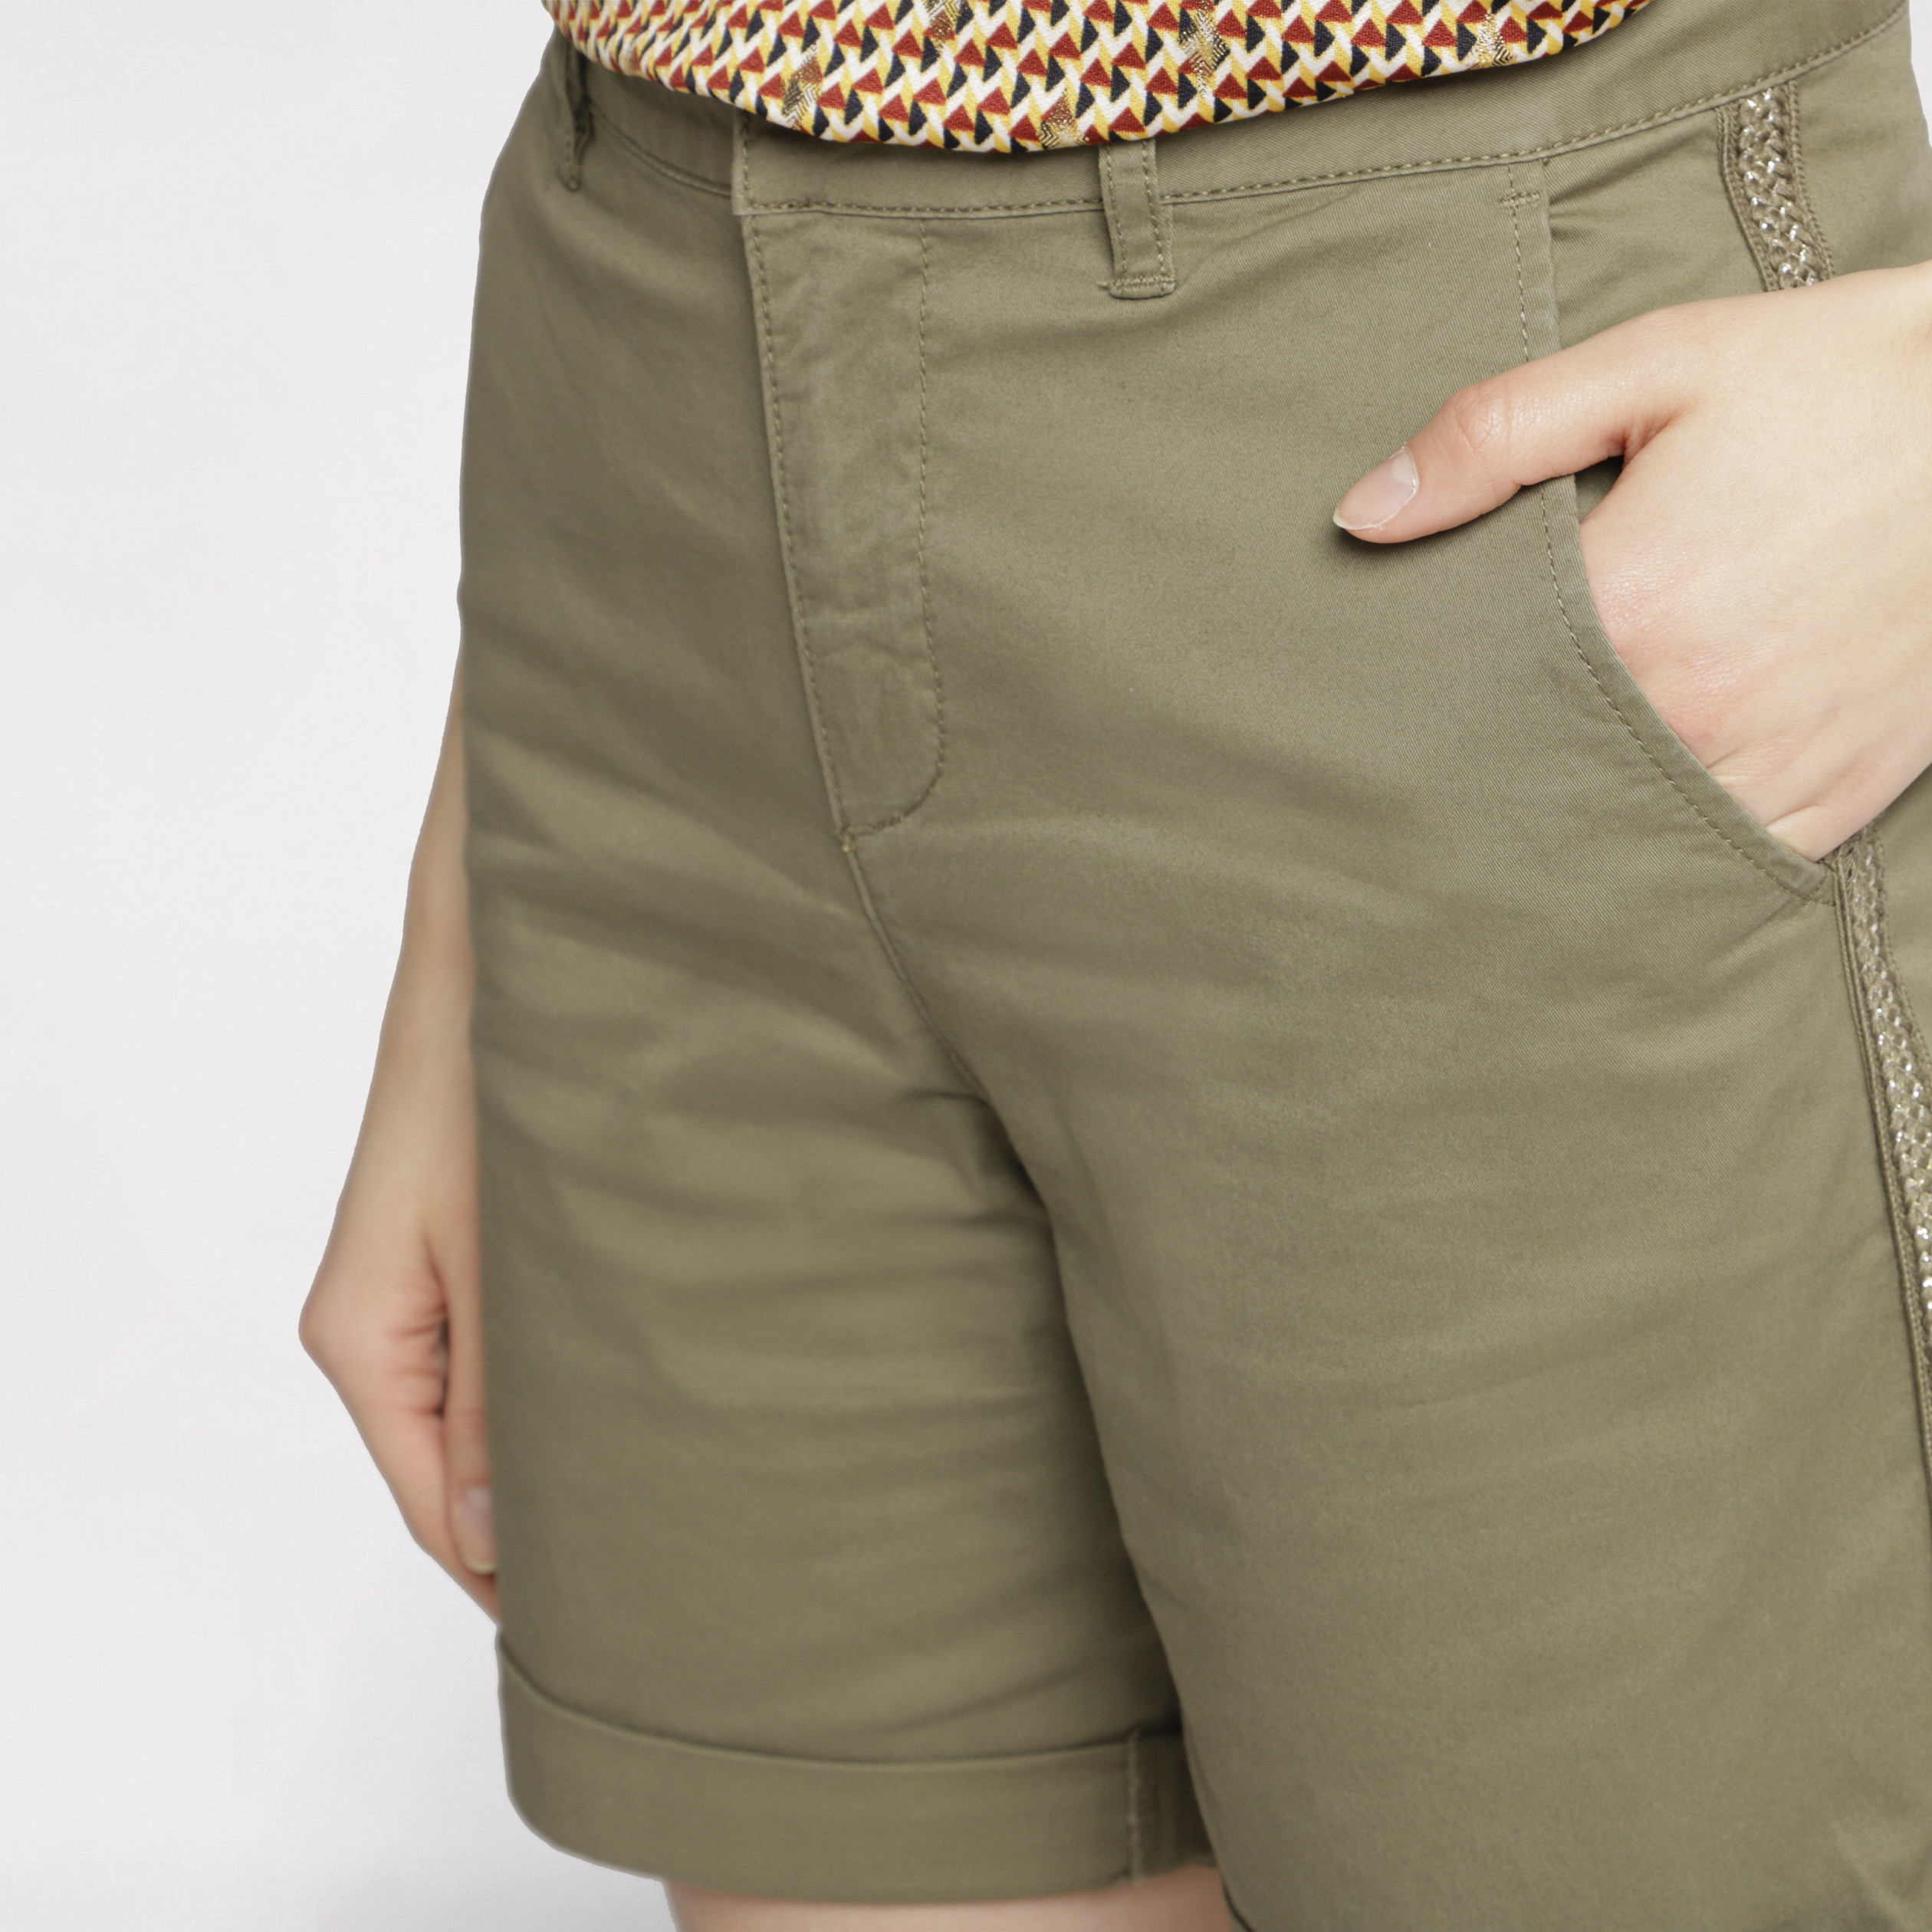 Bermuda Standard Kaki Droit Femme Taille Vert sChtQrdx